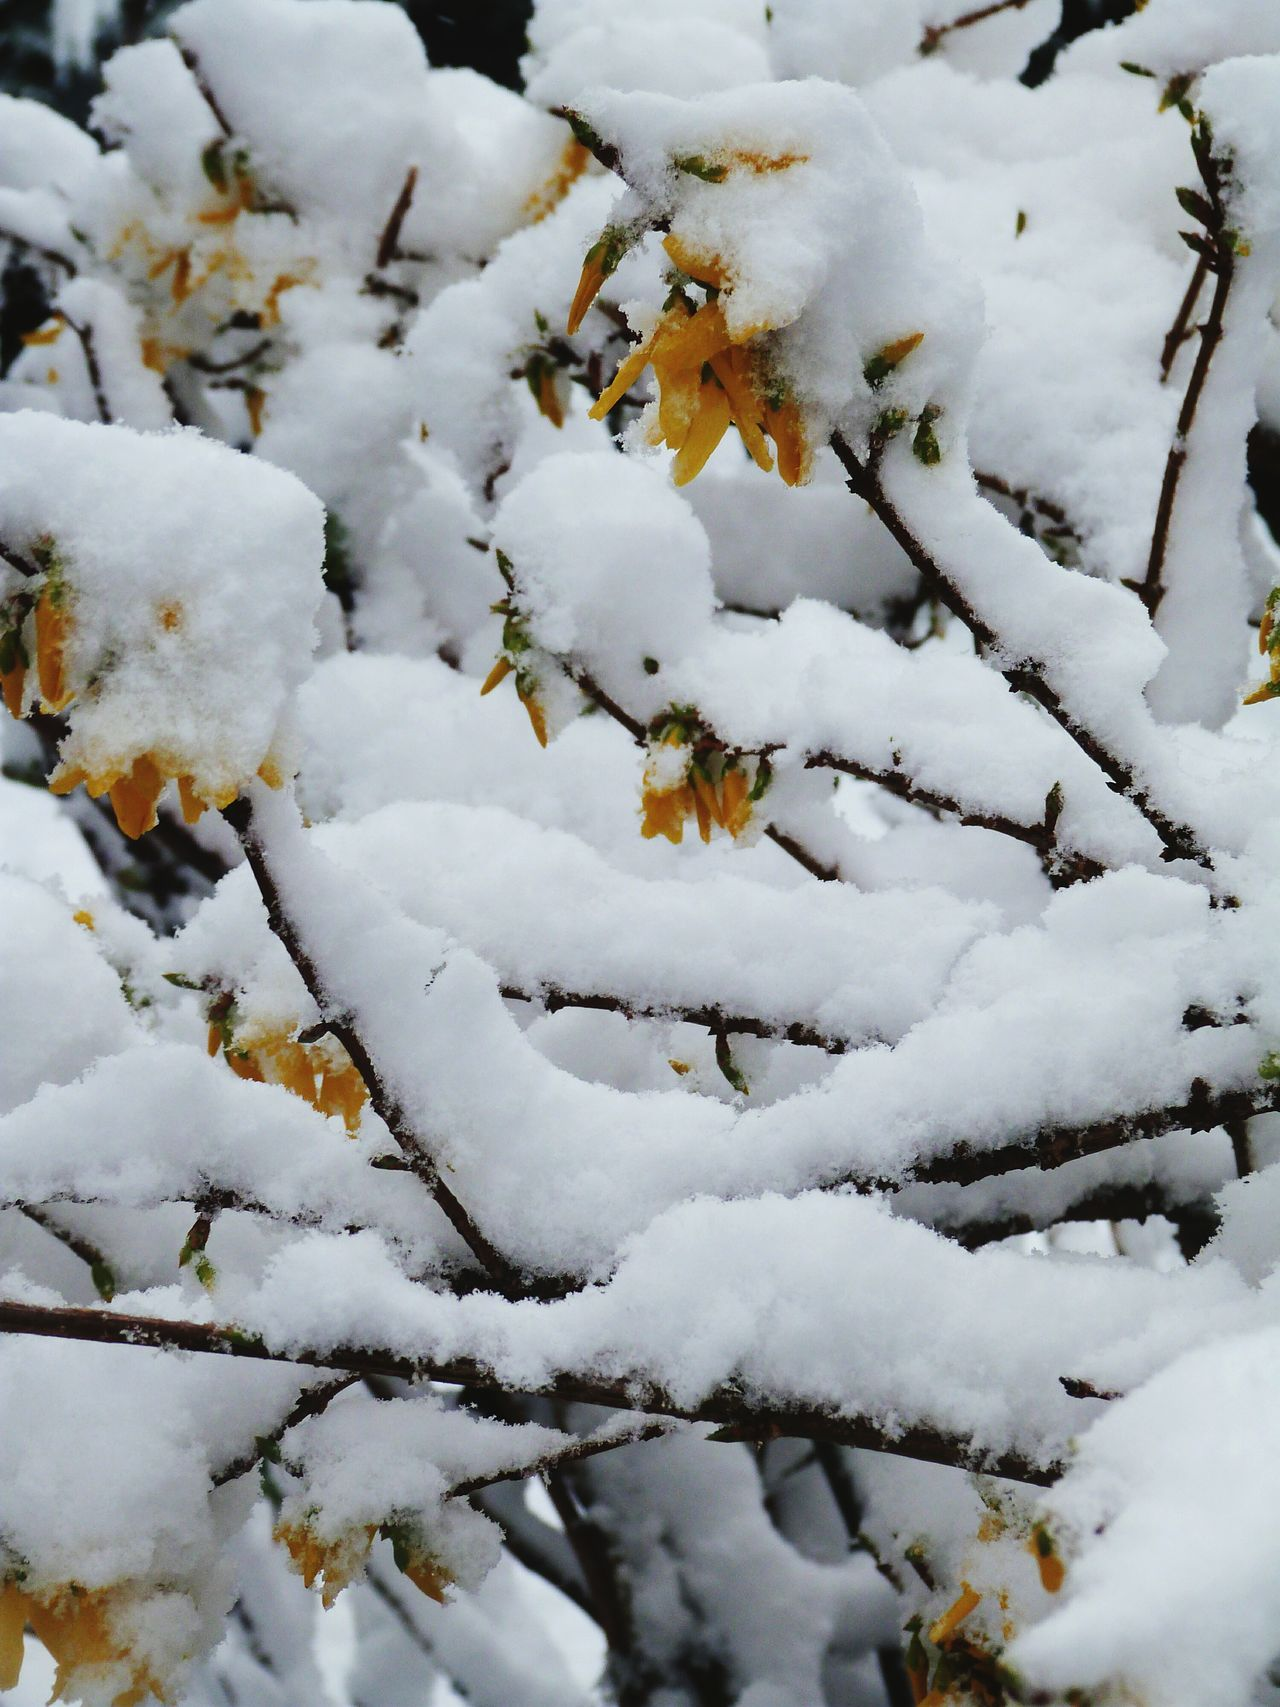 Forsythia Forsythia Snow Winter Nature Outdoors Close-up Pretty Scotland No People Spring